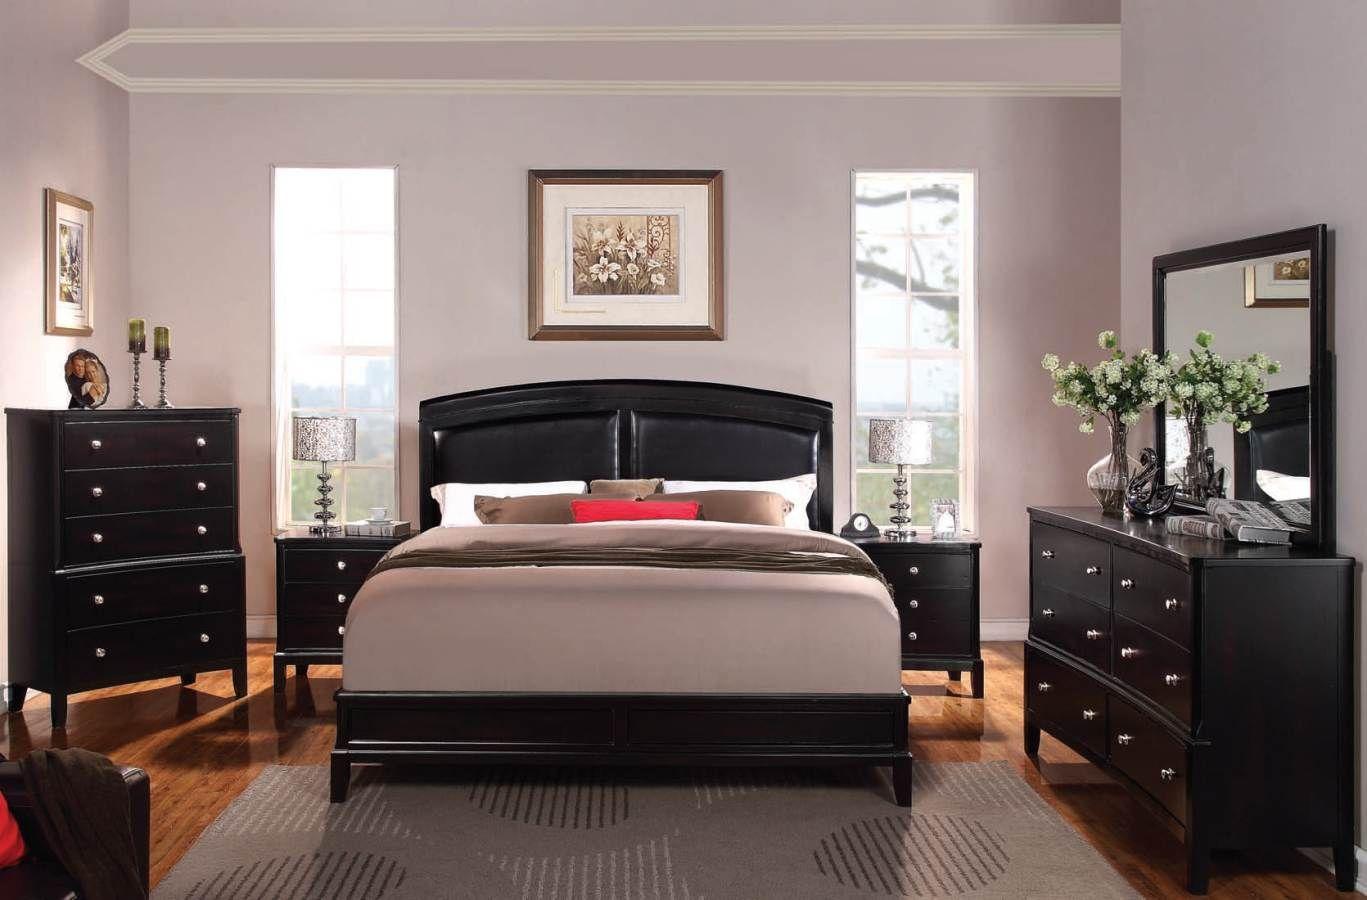 Abram Espresso Wood Faux Leather Master Bedroom Set Black Bedroom Furniture Dark Bedroom Furniture Wood Bedroom Furniture Sets